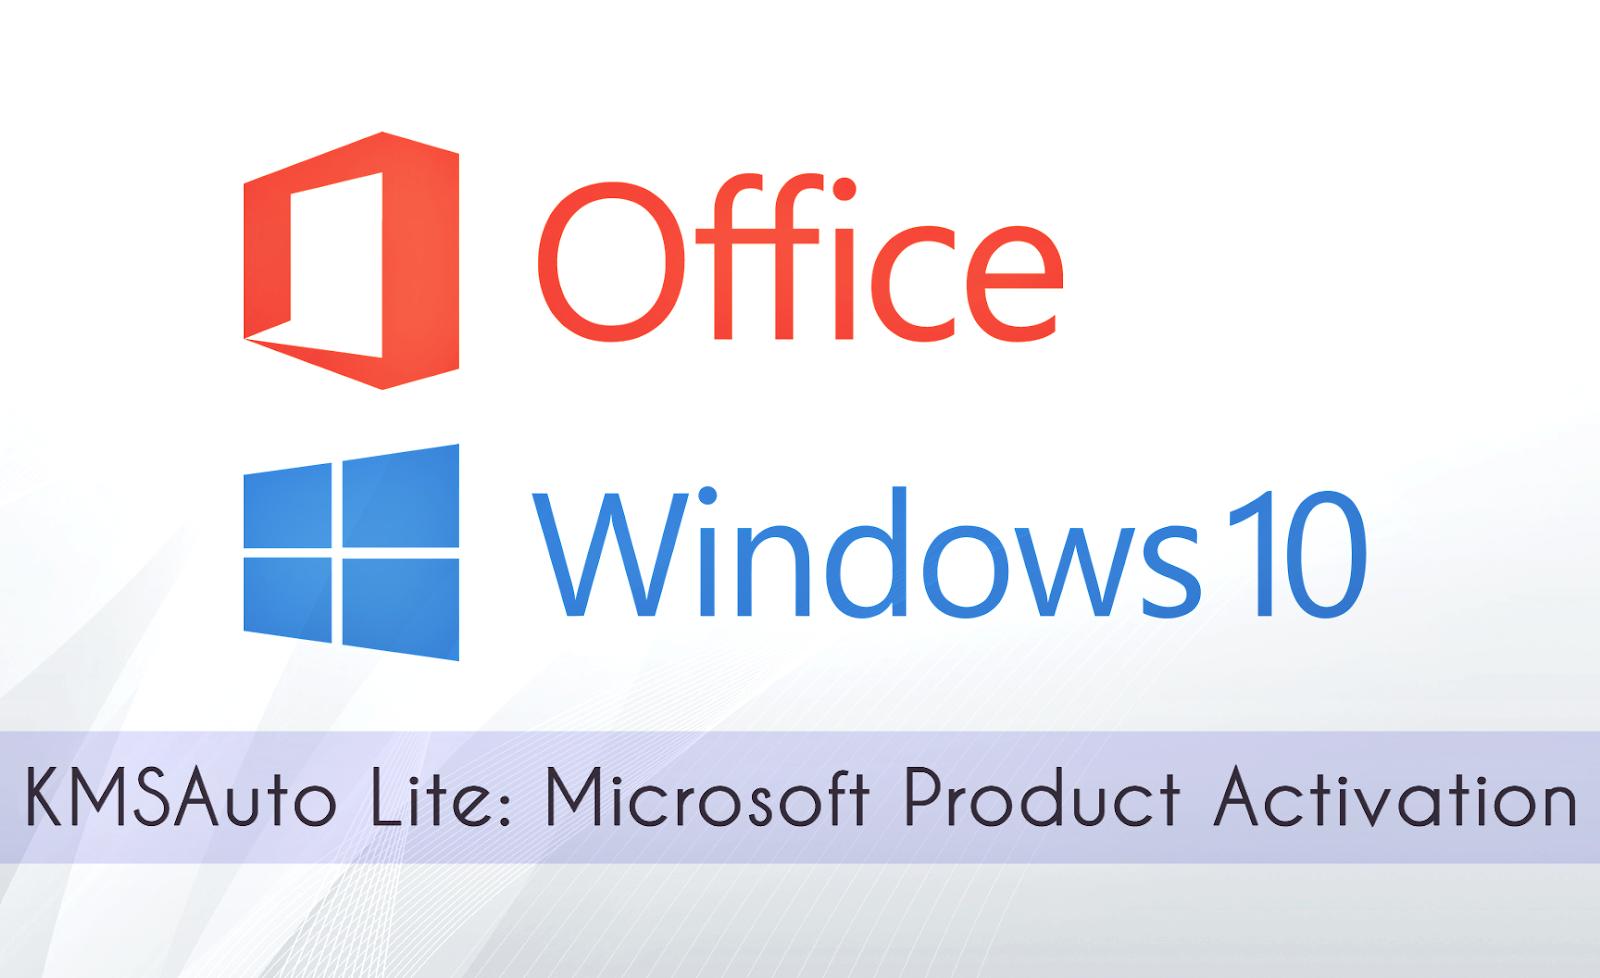 fedee74efadb5d52bbcd93e46575a8c7 - Vpn Client Adapter Windows 7 Download 64 Bit